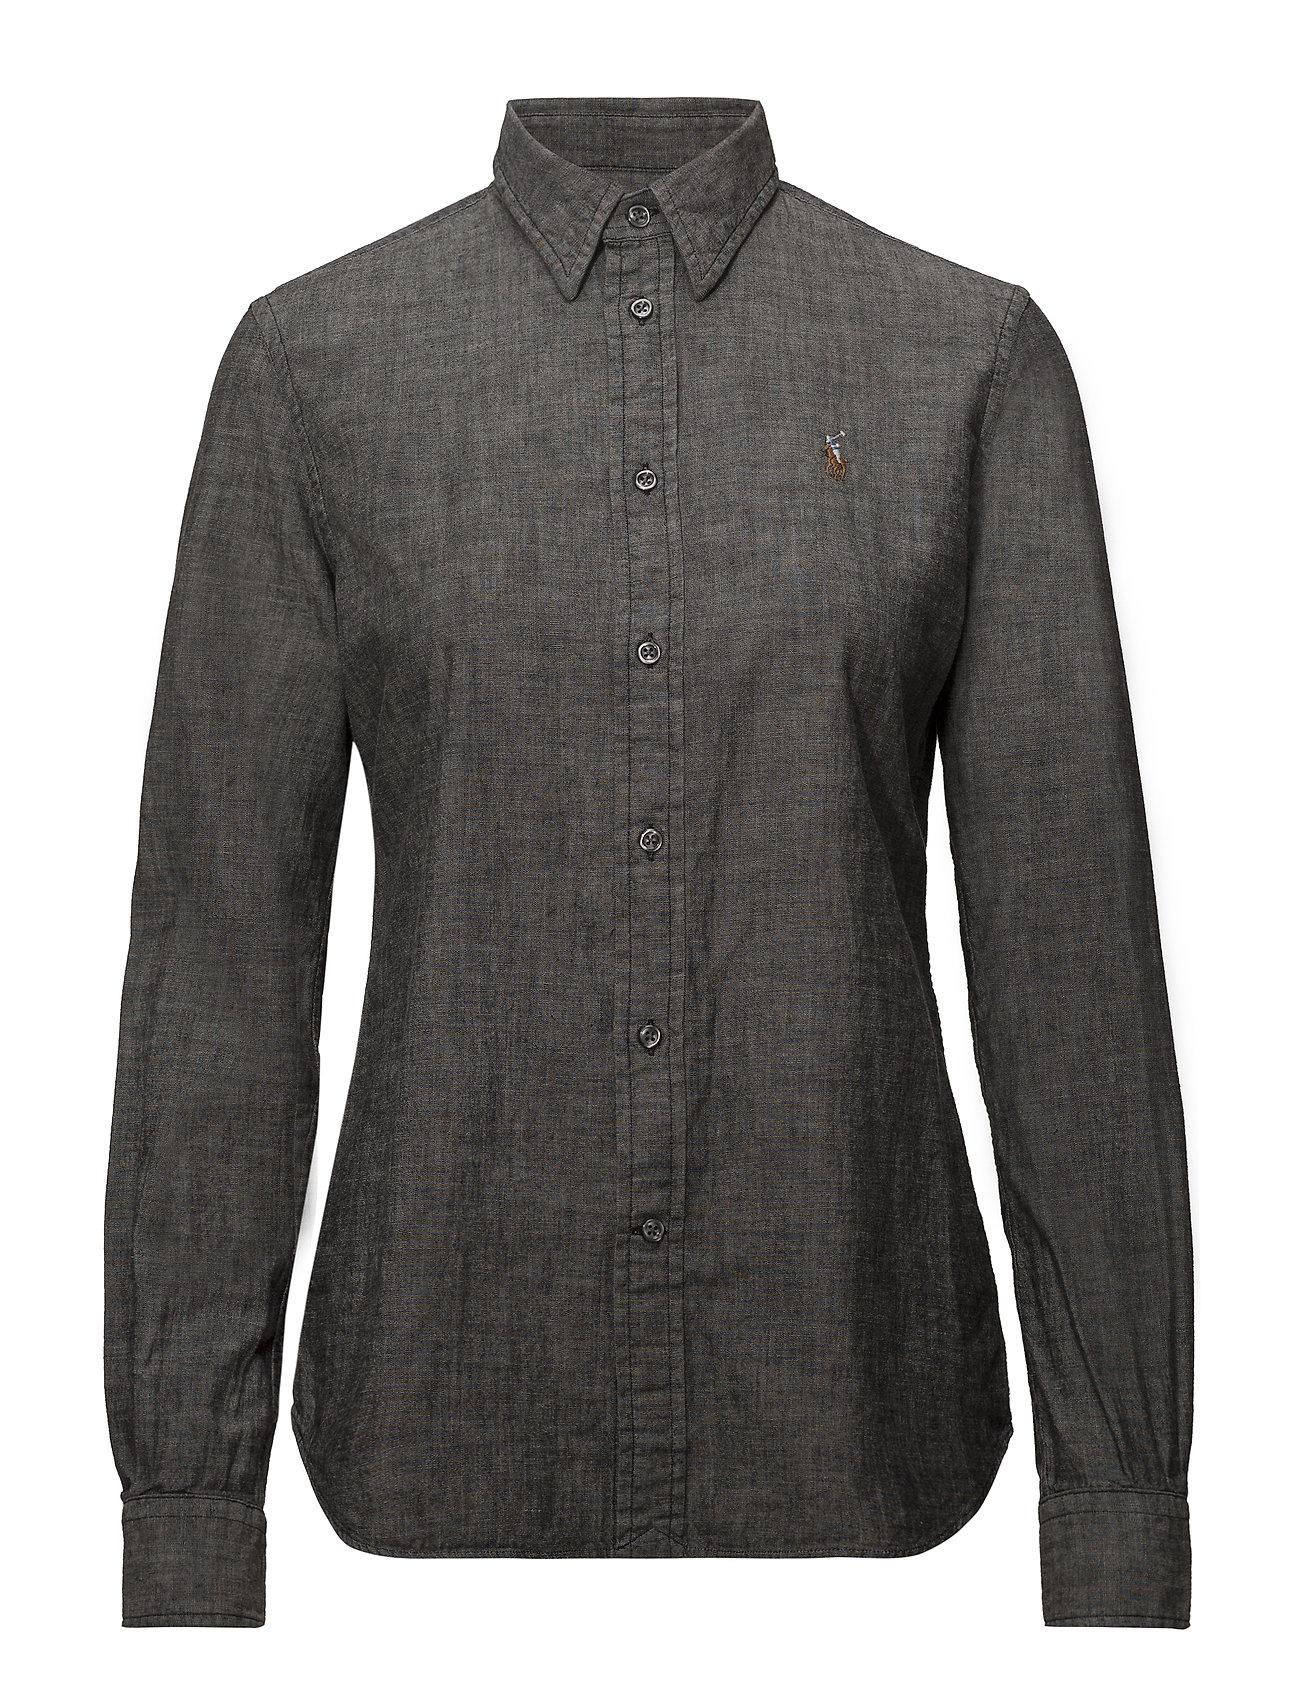 Polo Ralph Lauren Slim Fit Chambray Shirt